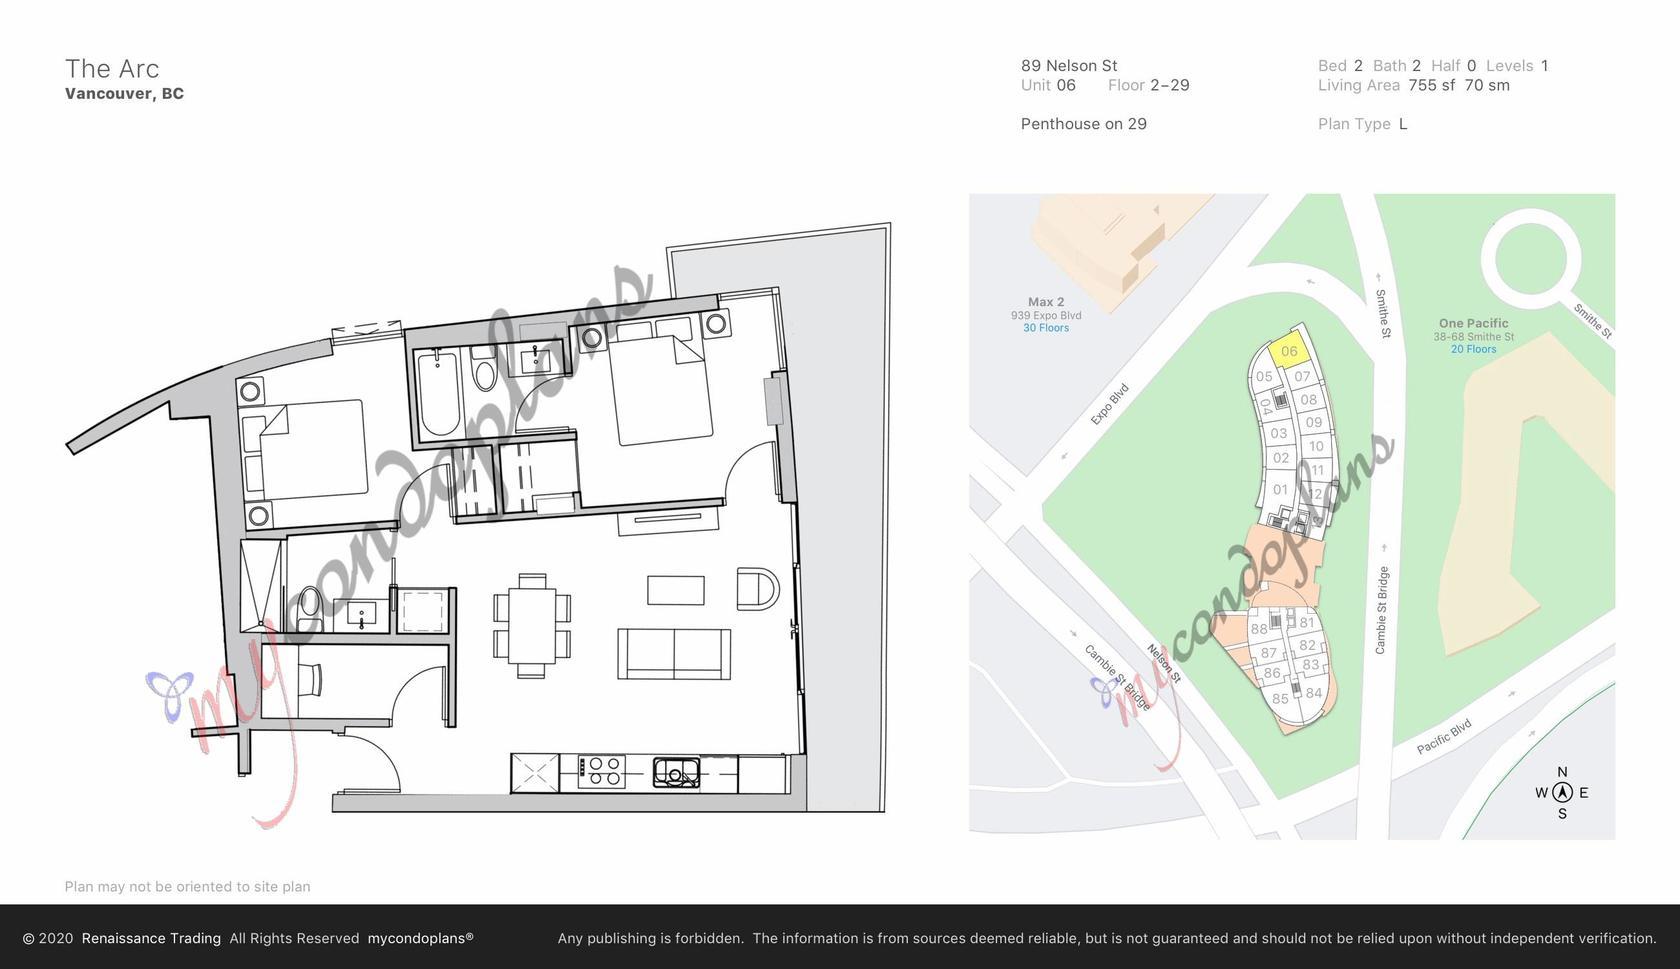 floor_plan_44c4c17332cace2124a1a836d9fc4b6f-1 at 6th Floor - 89 Nelson Street, Yaletown, Vancouver West